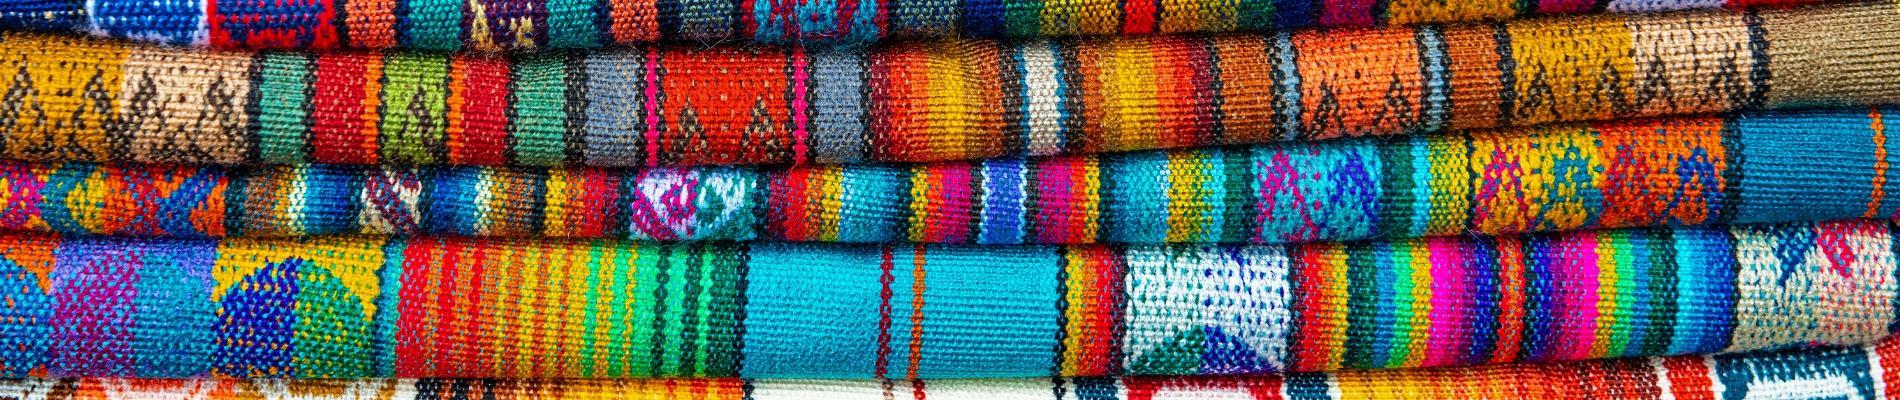 Otavalo Full Day Trip